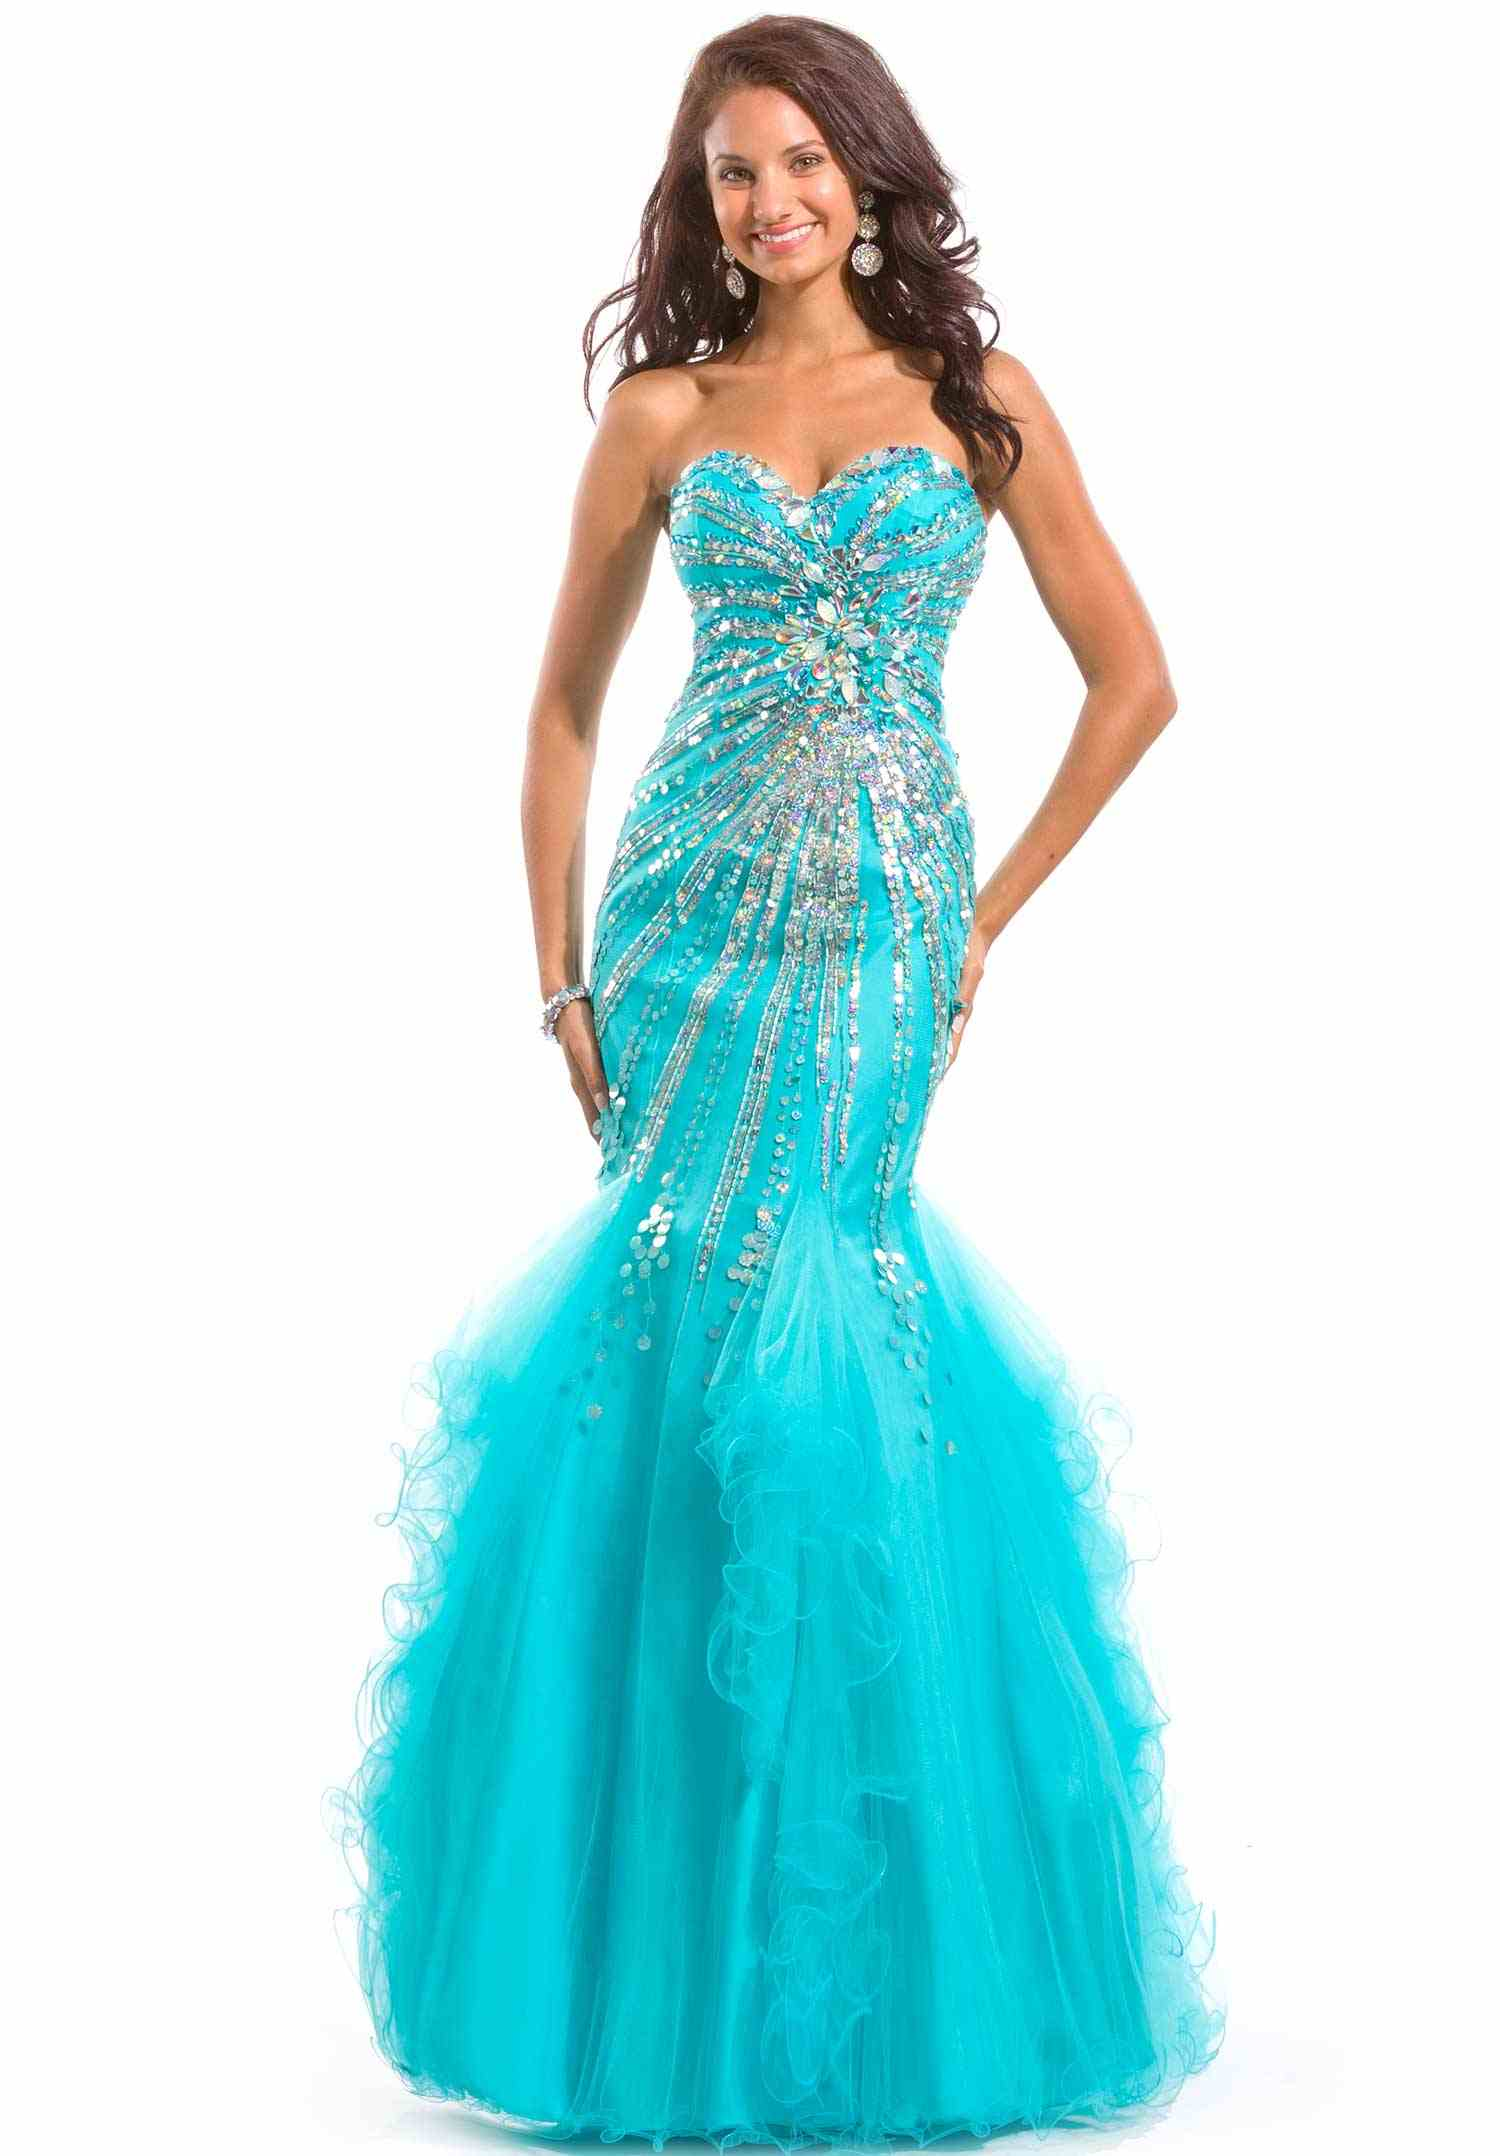 Fancy Party Time Prom Dresses Photo - Wedding Dress Ideas ...